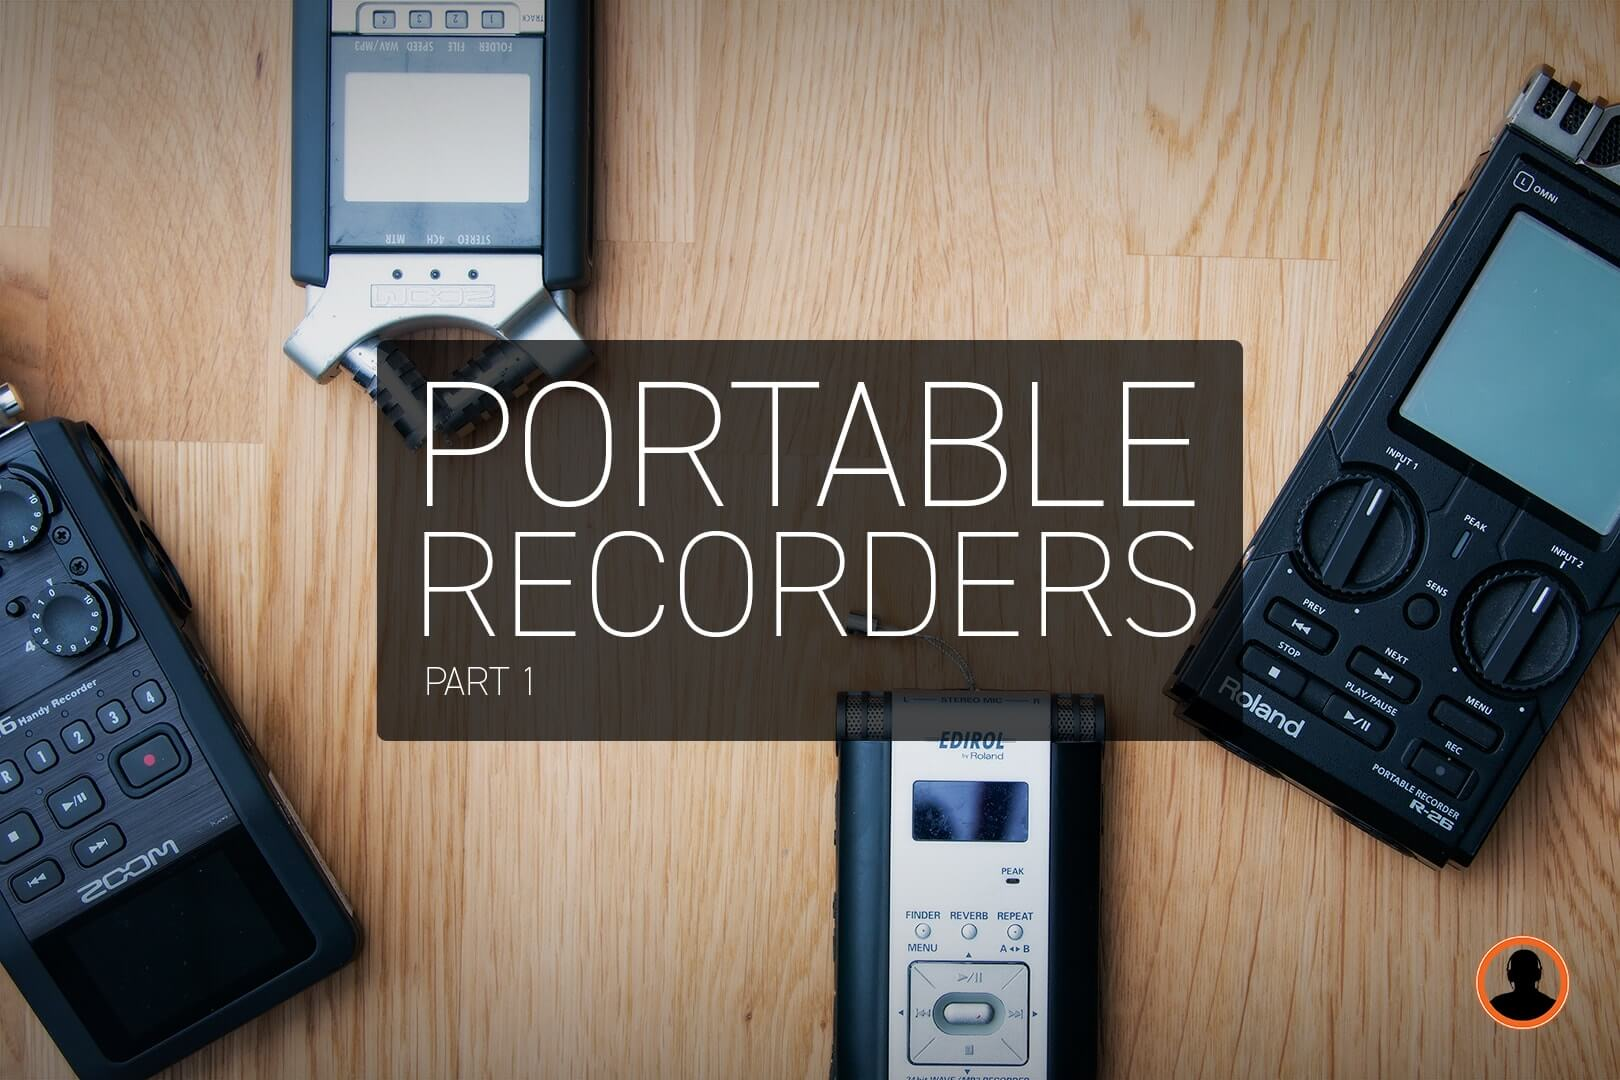 Portable Recorders (Part 1)